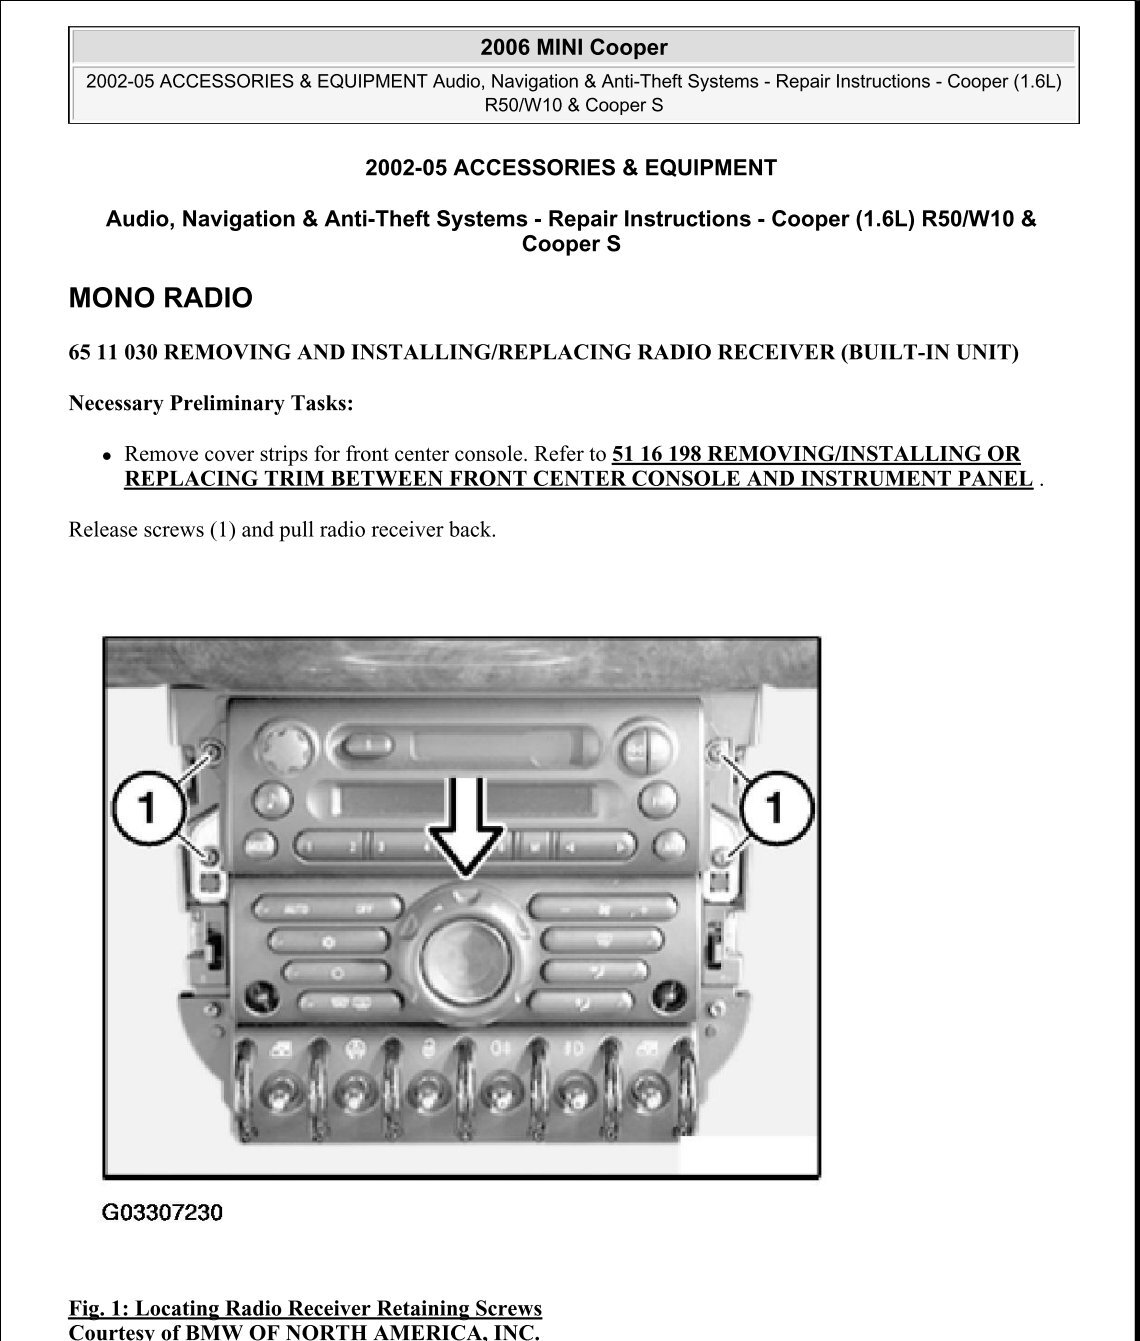 Mini Cooper Radio Wiring Diagram Dolgular Com Mini Cooper Rear Speaker Wire Colors Land Rover Discovery Radio Wiring Diagram On Mini Cooper Radio Wiring Diagram Dolgular